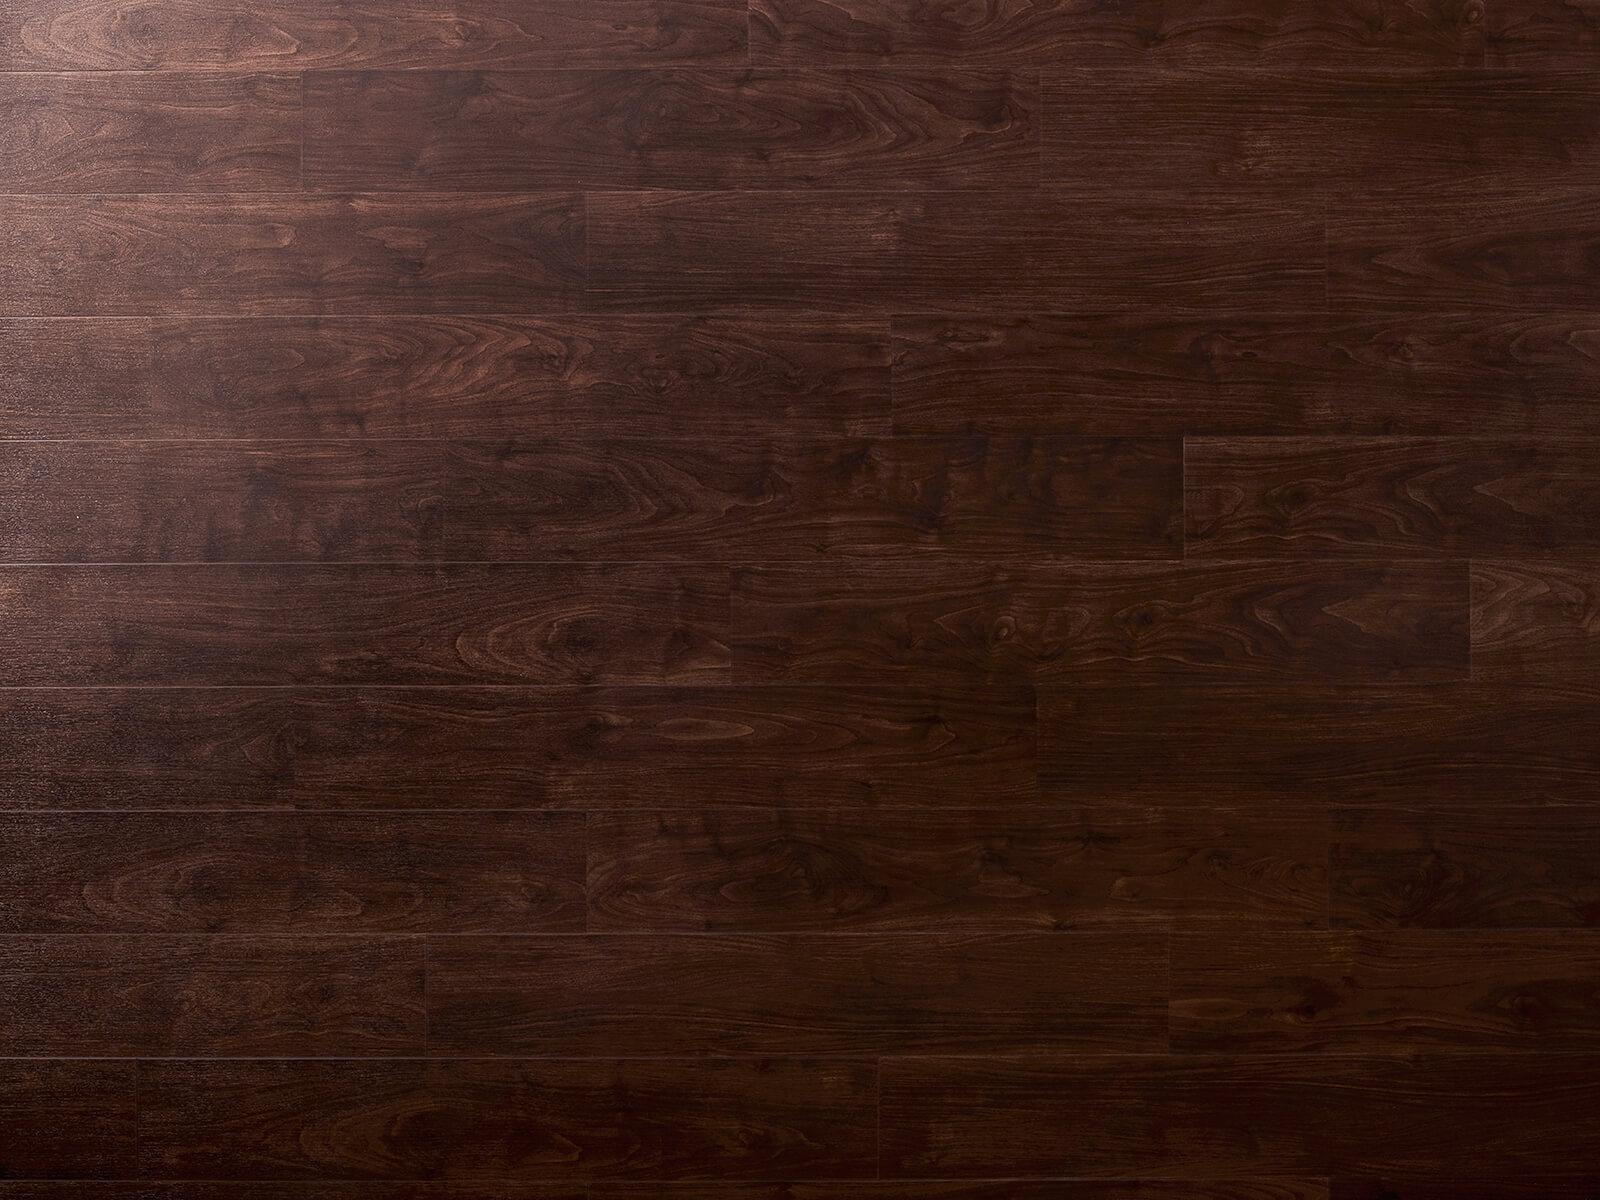 Home Gym Design: Amtico Commercial LVT Flooring From